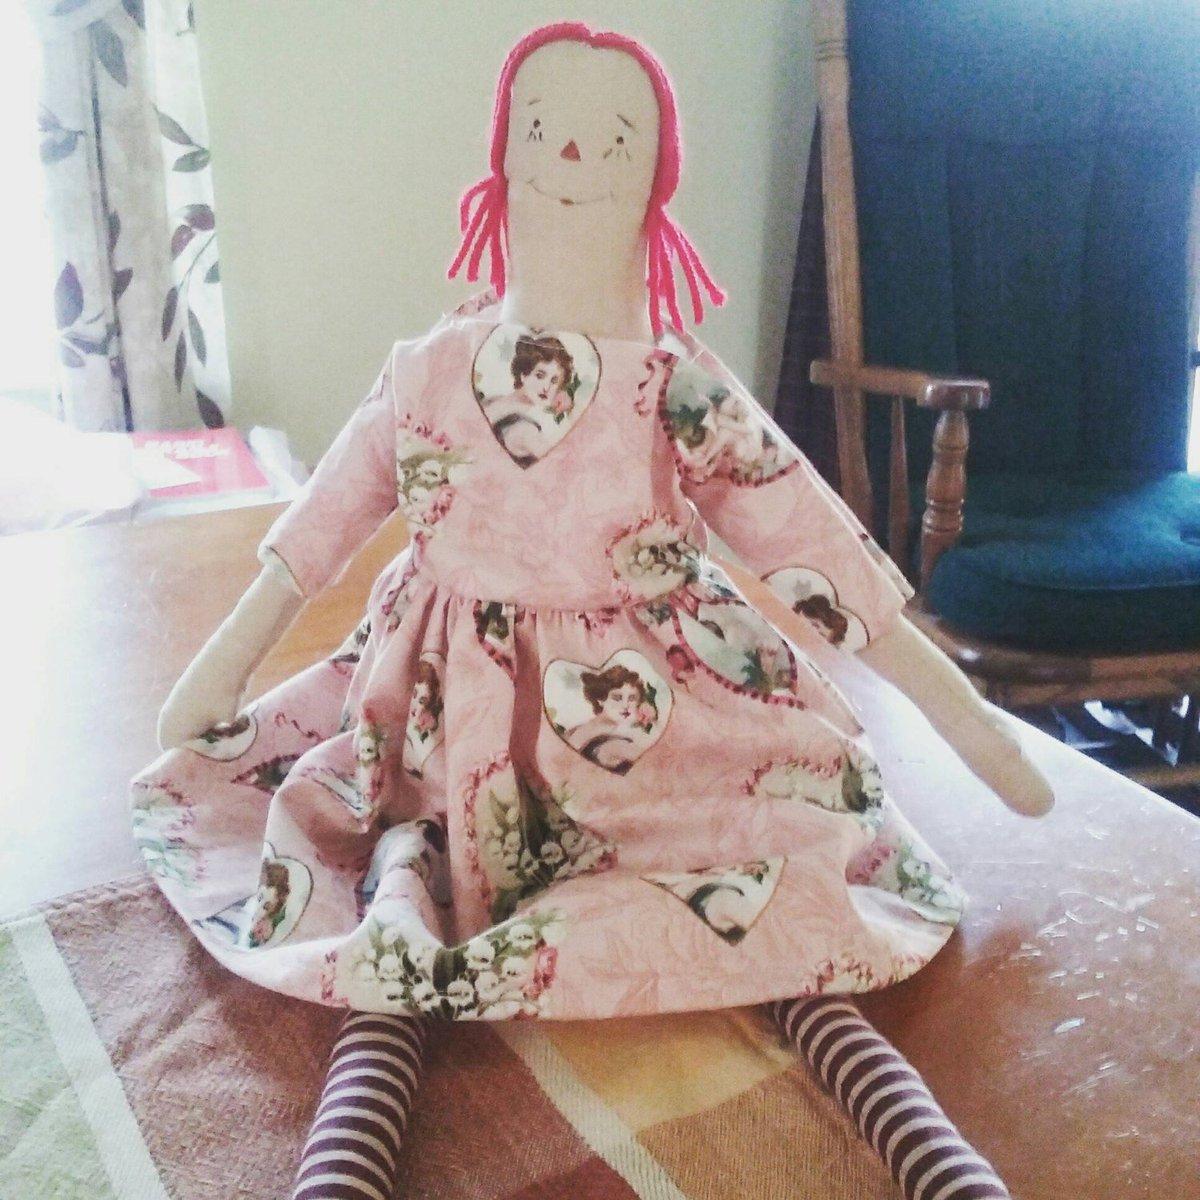 Raggedy Franny Doll, Easter gift, Vintage Valentine&#39;s Fabric, Hand…  http:// tuppu.net/565986ba  &nbsp;   #EpicOnEtsy #RaggedyDoll<br>http://pic.twitter.com/twgLW5GwpJ